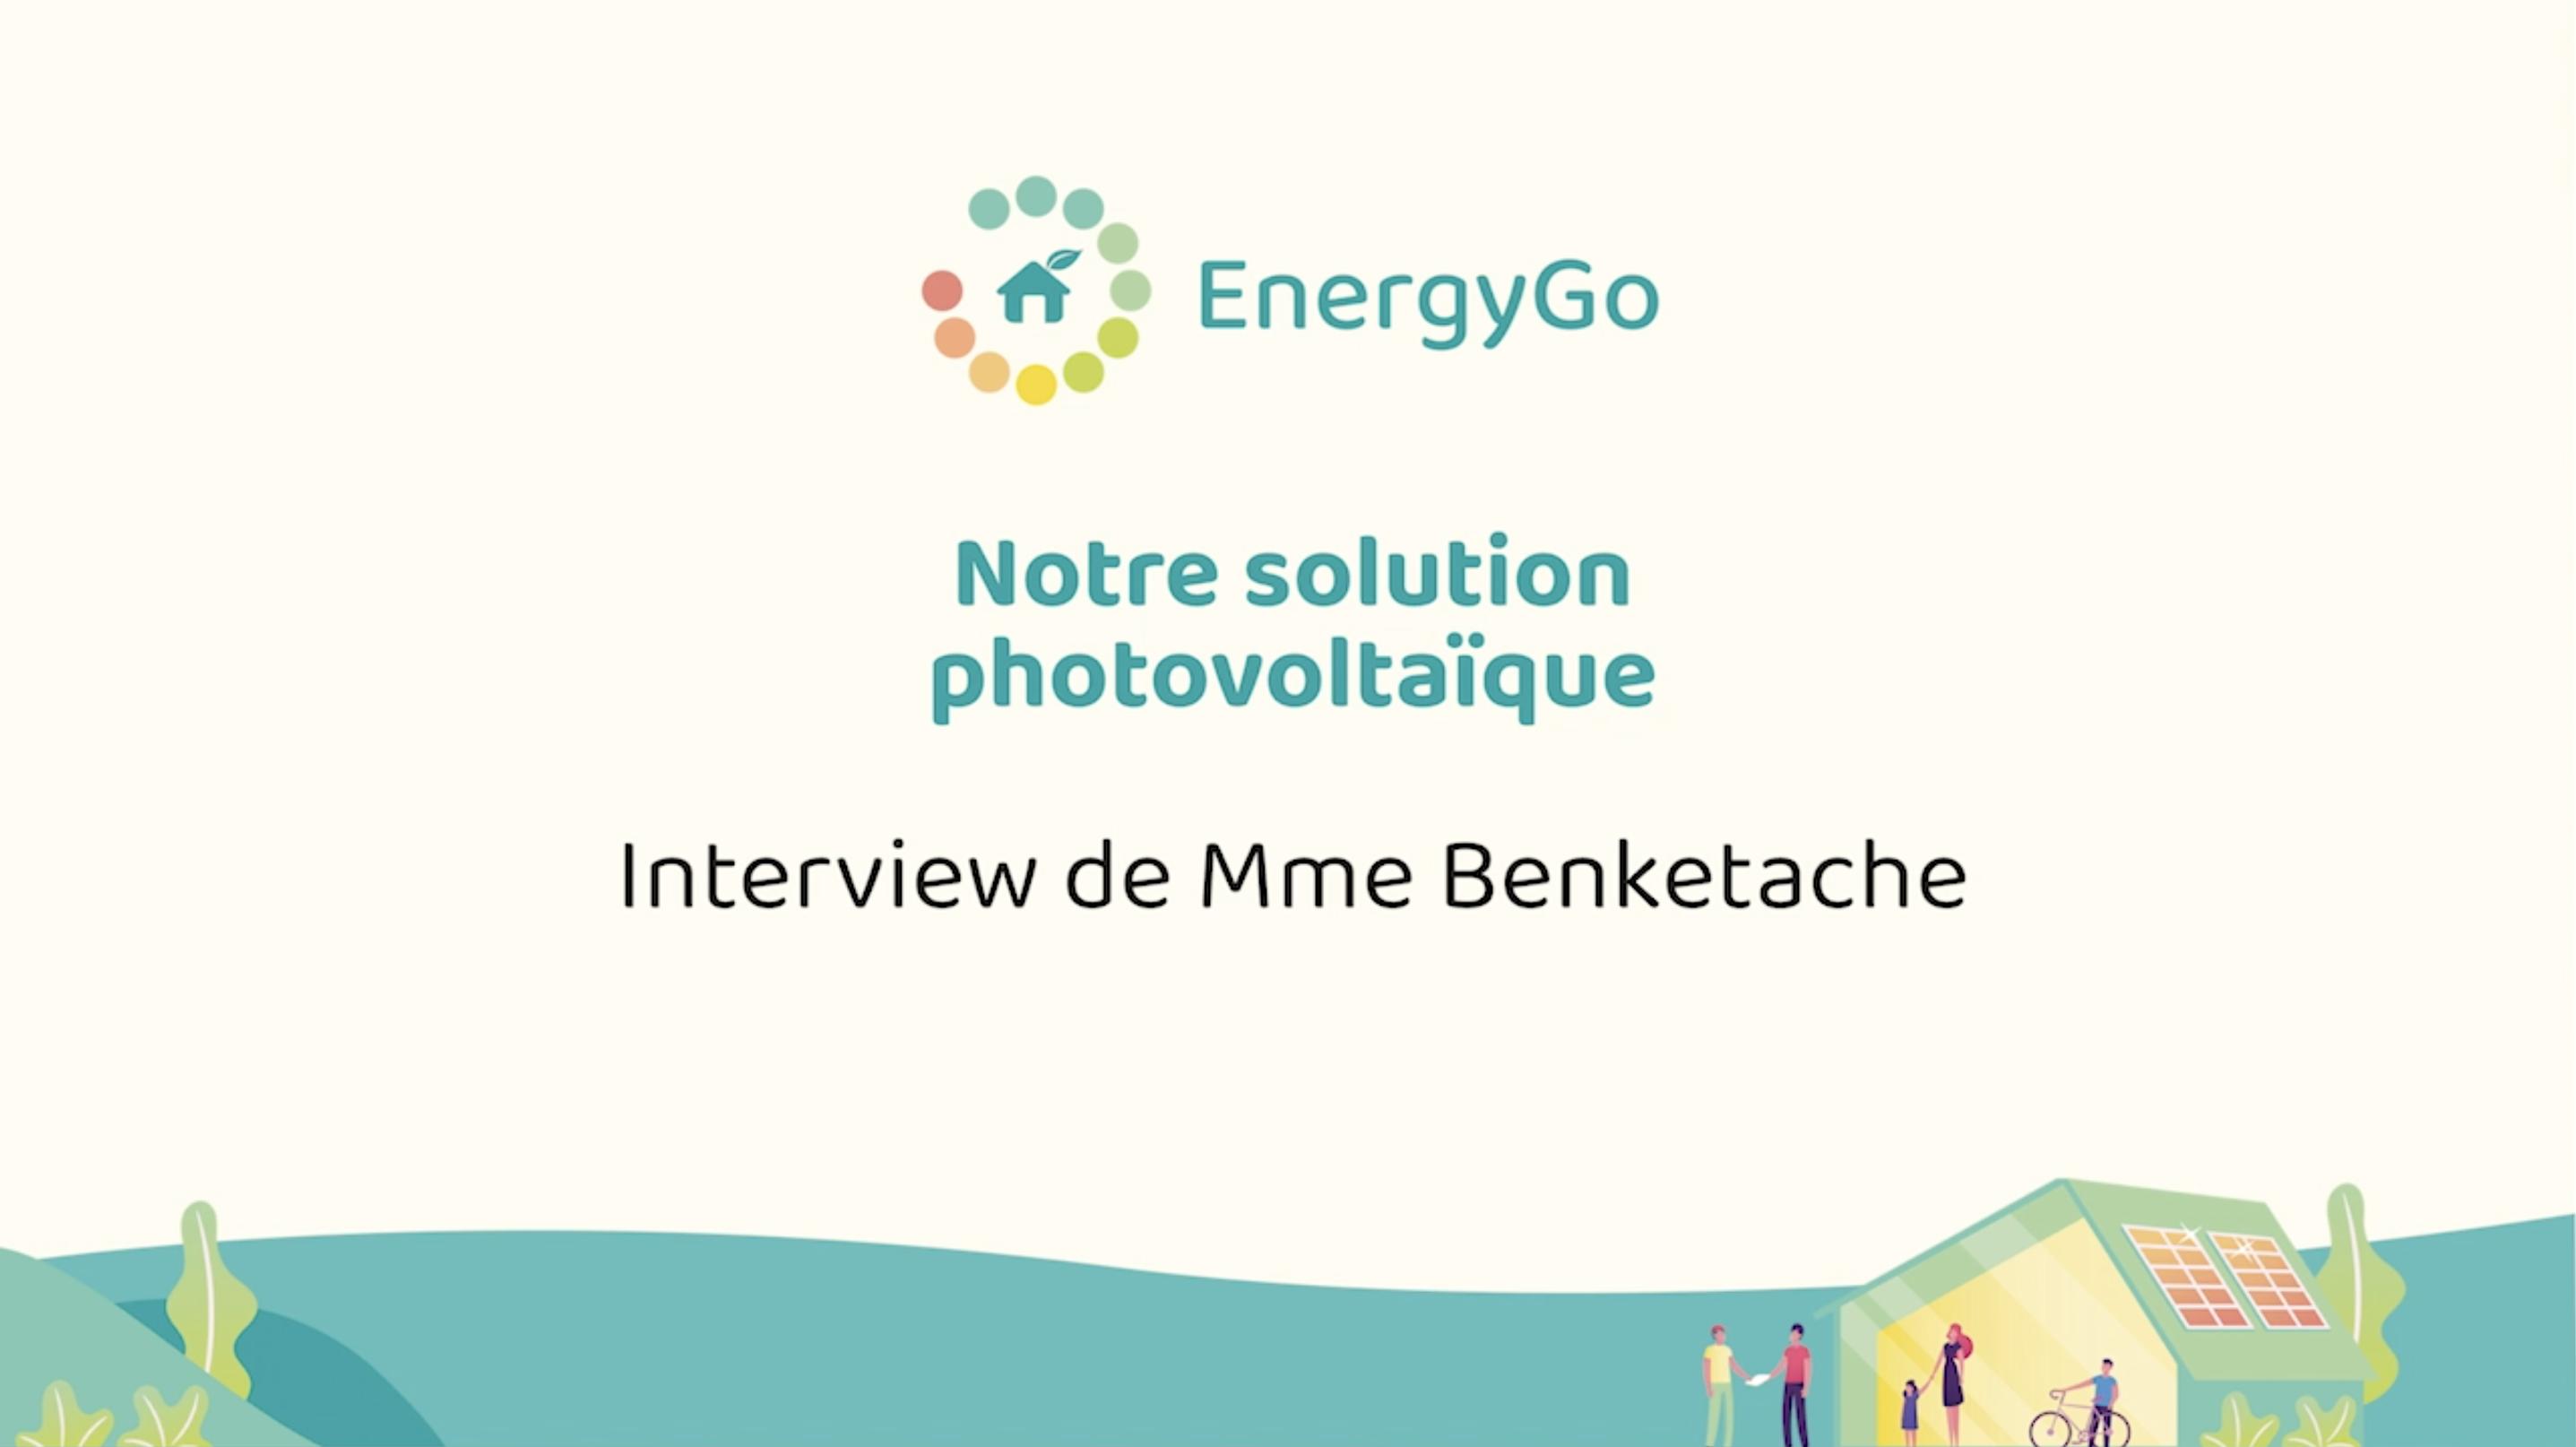 Notre solution solaire | EnergyGo